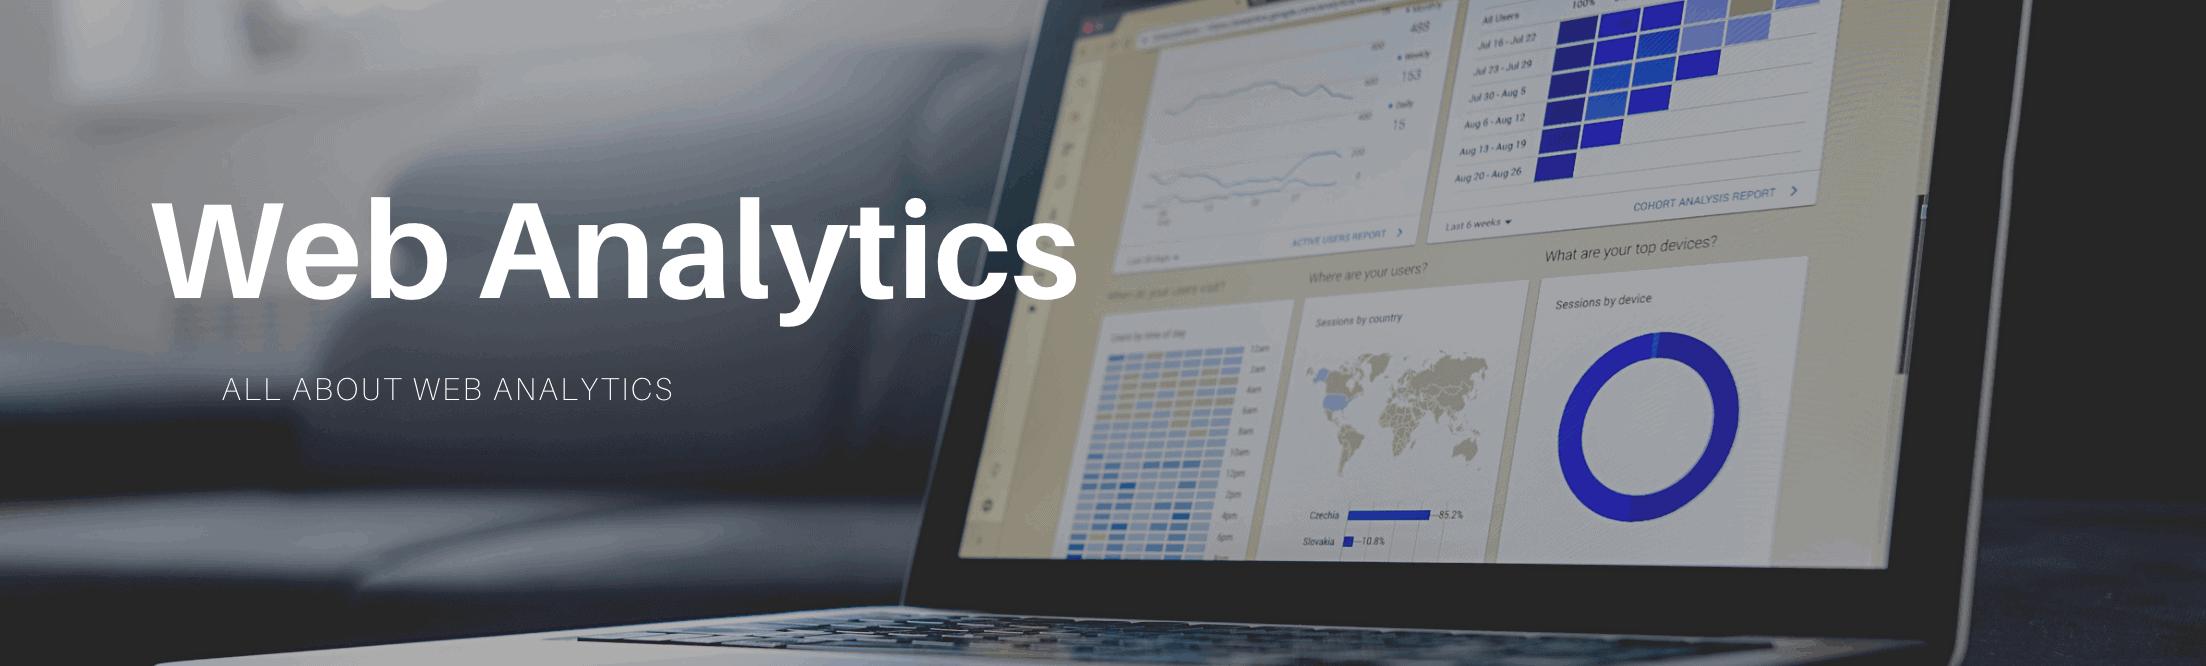 banner image of web analytics